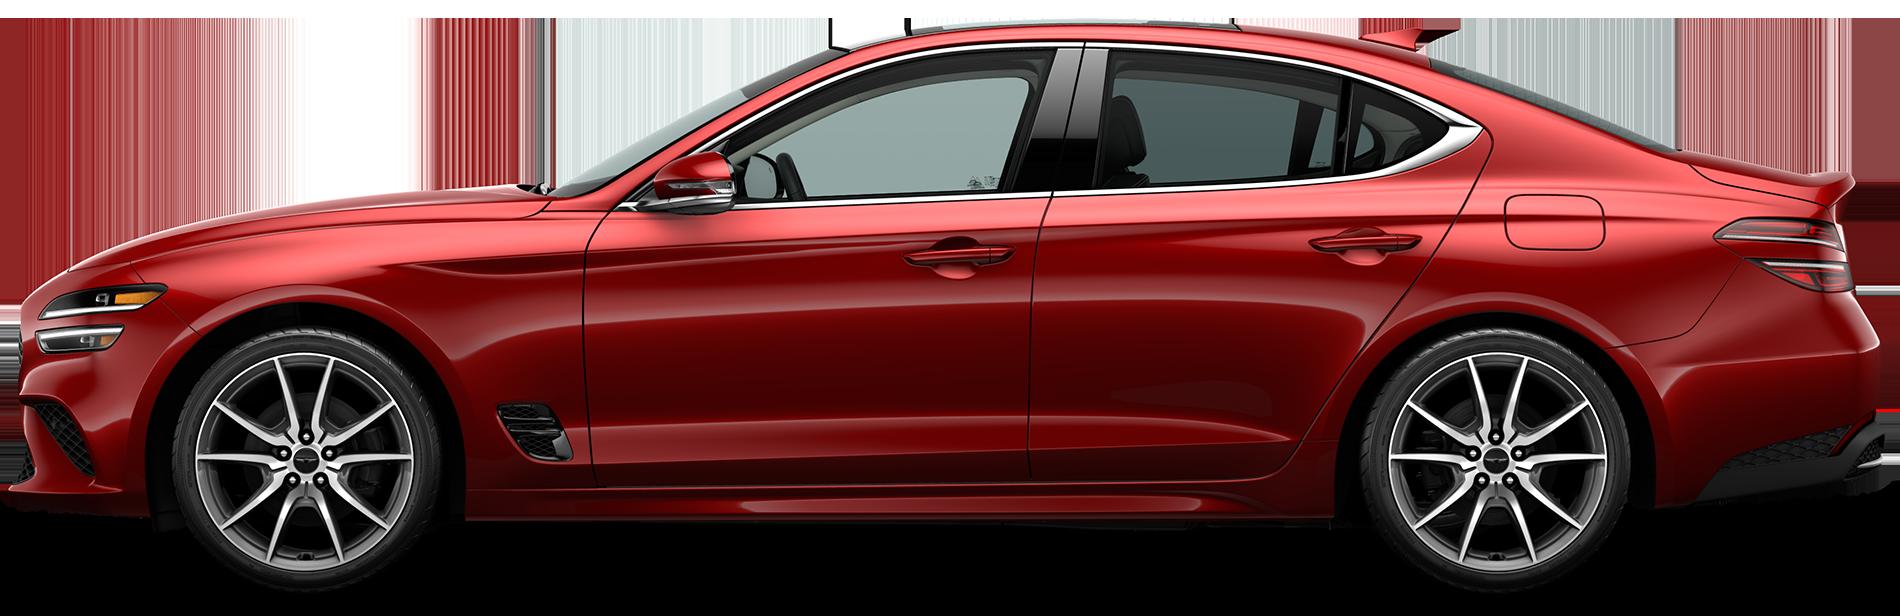 2022 Genesis G70 Sedan 2.0T